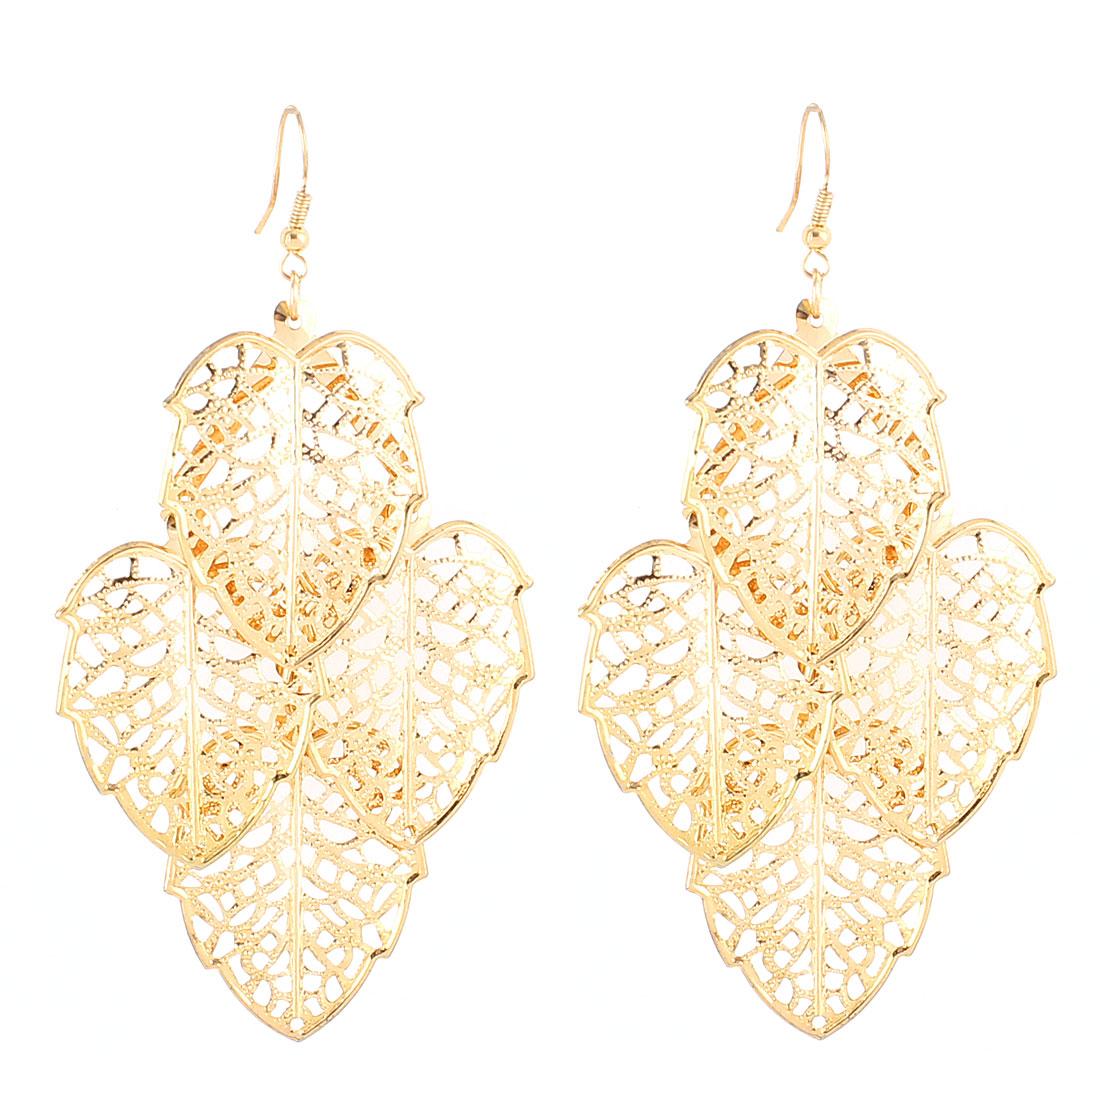 Leaf Shaped Pendant Hook Dangle Eardrop Earrings Pair Gold Tone for Lady